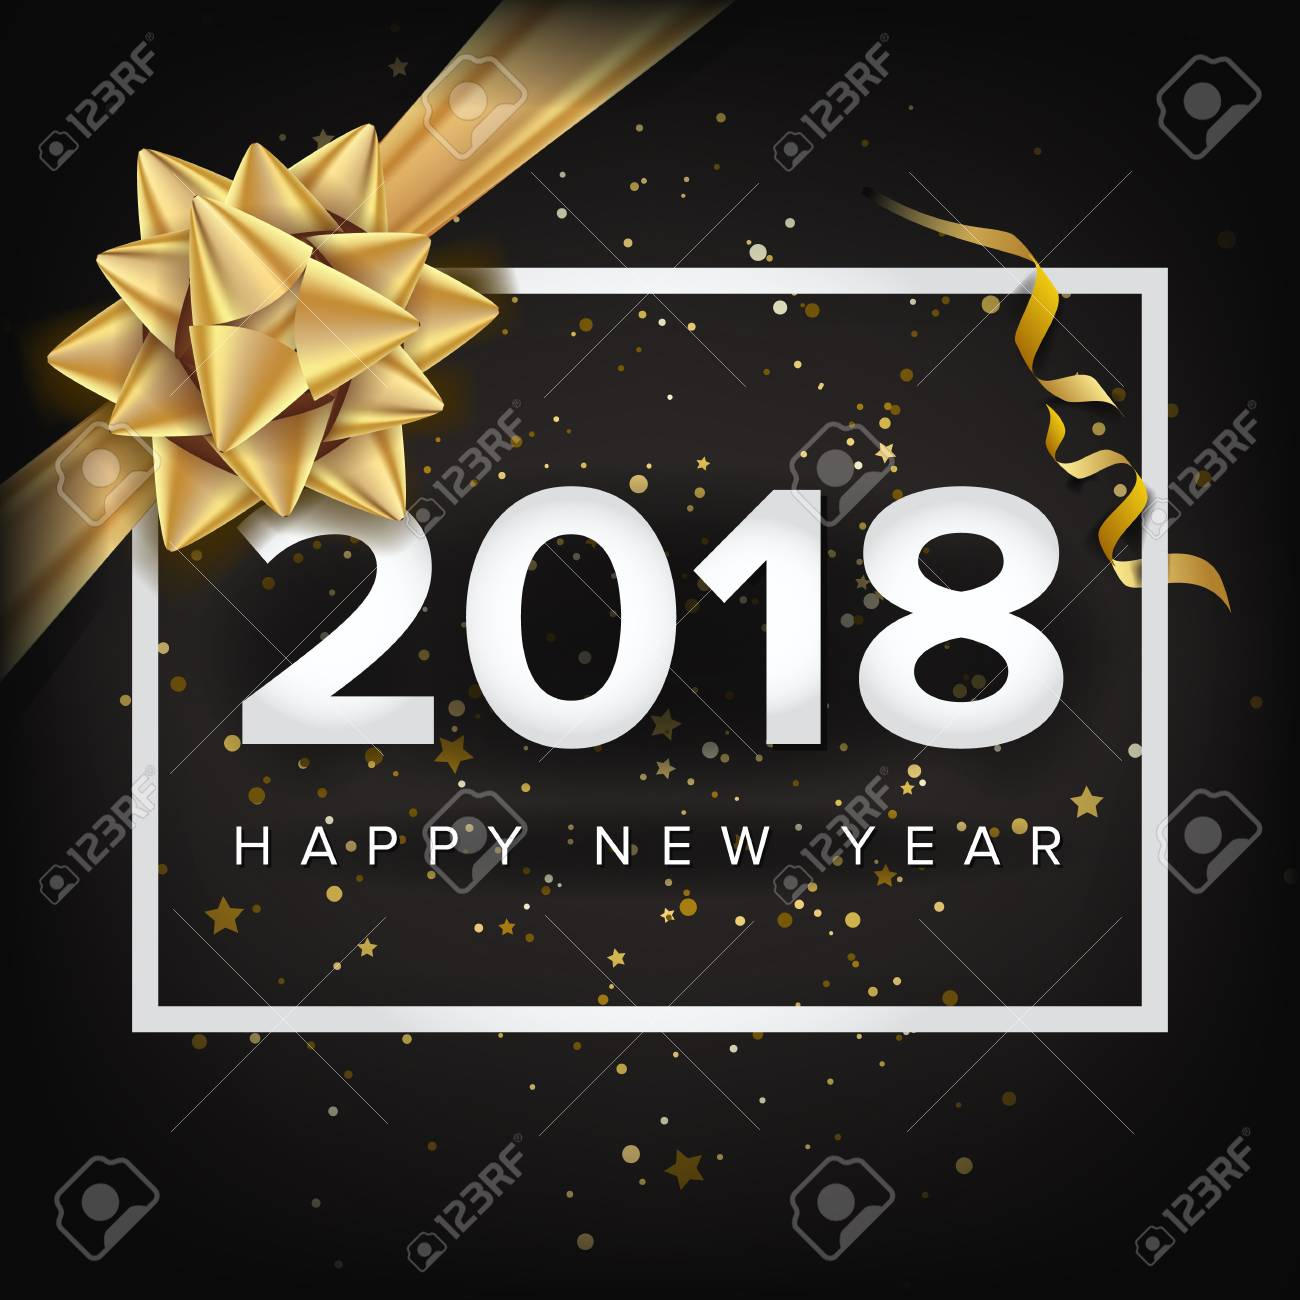 Happy new year 2018 invitation vector christmas greeting card happy new year 2018 invitation vector christmas greeting card modern new year poster m4hsunfo